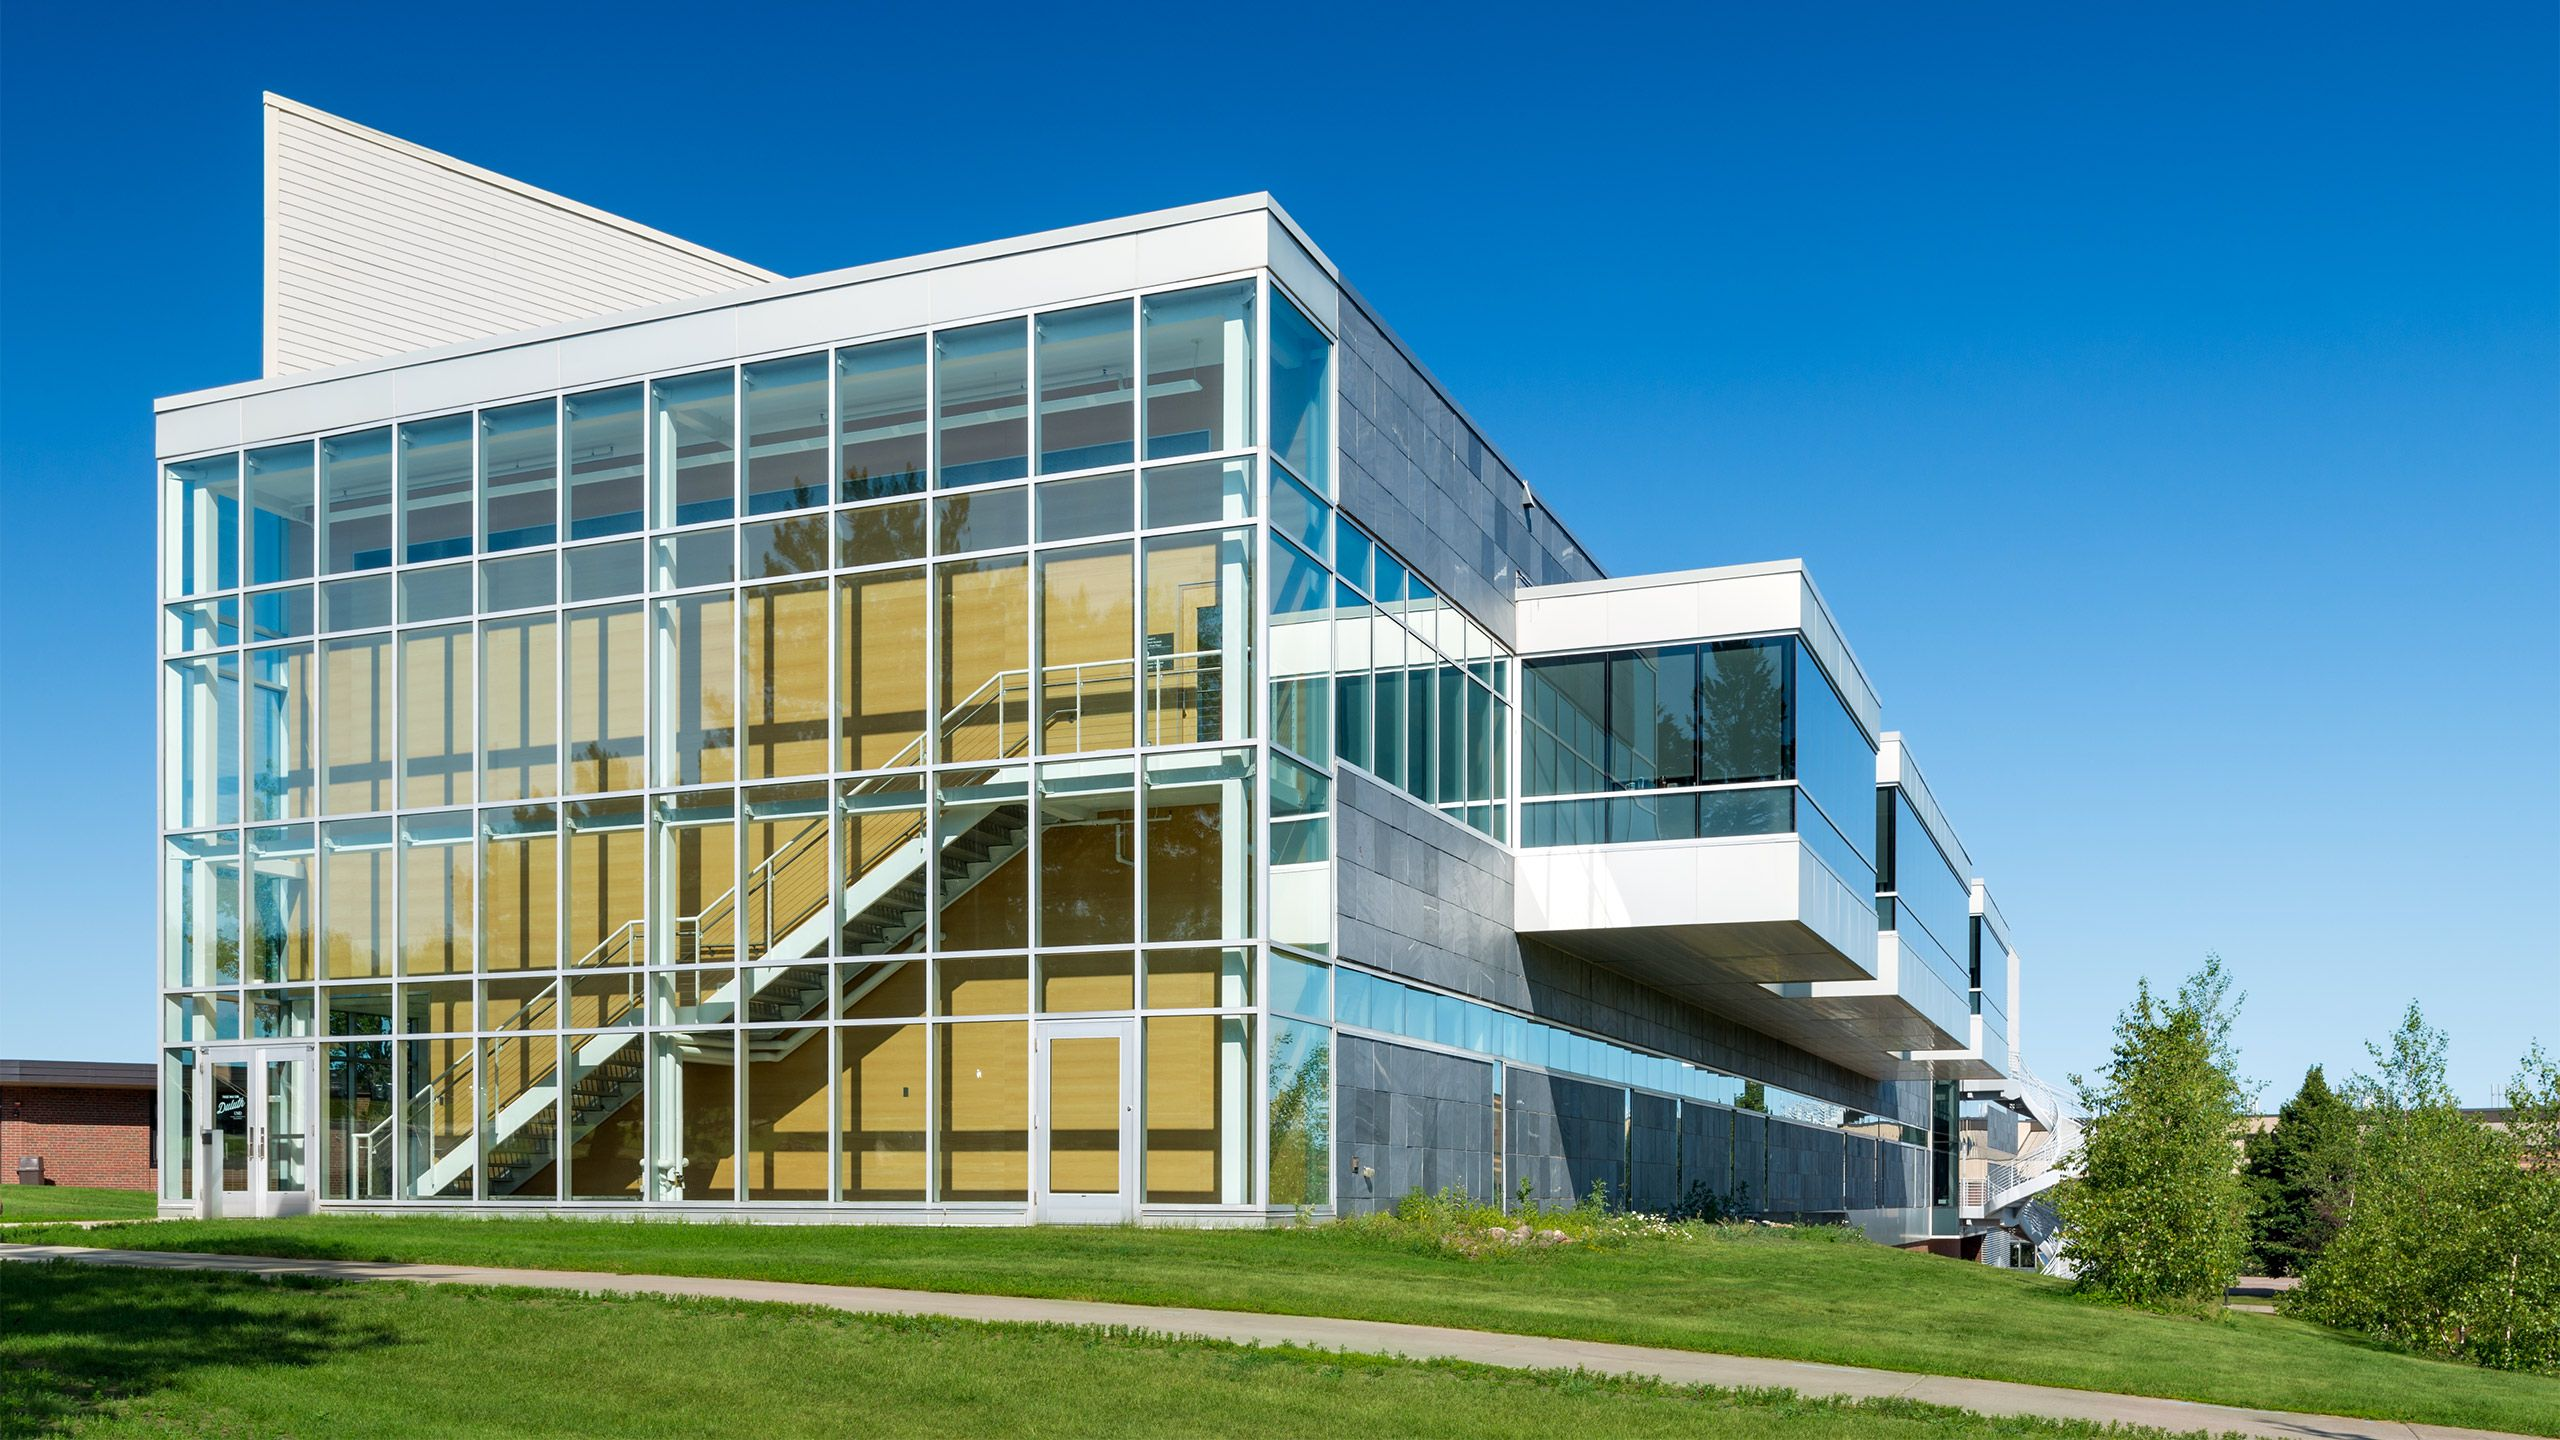 SWENSON SCIENCE BUILDING